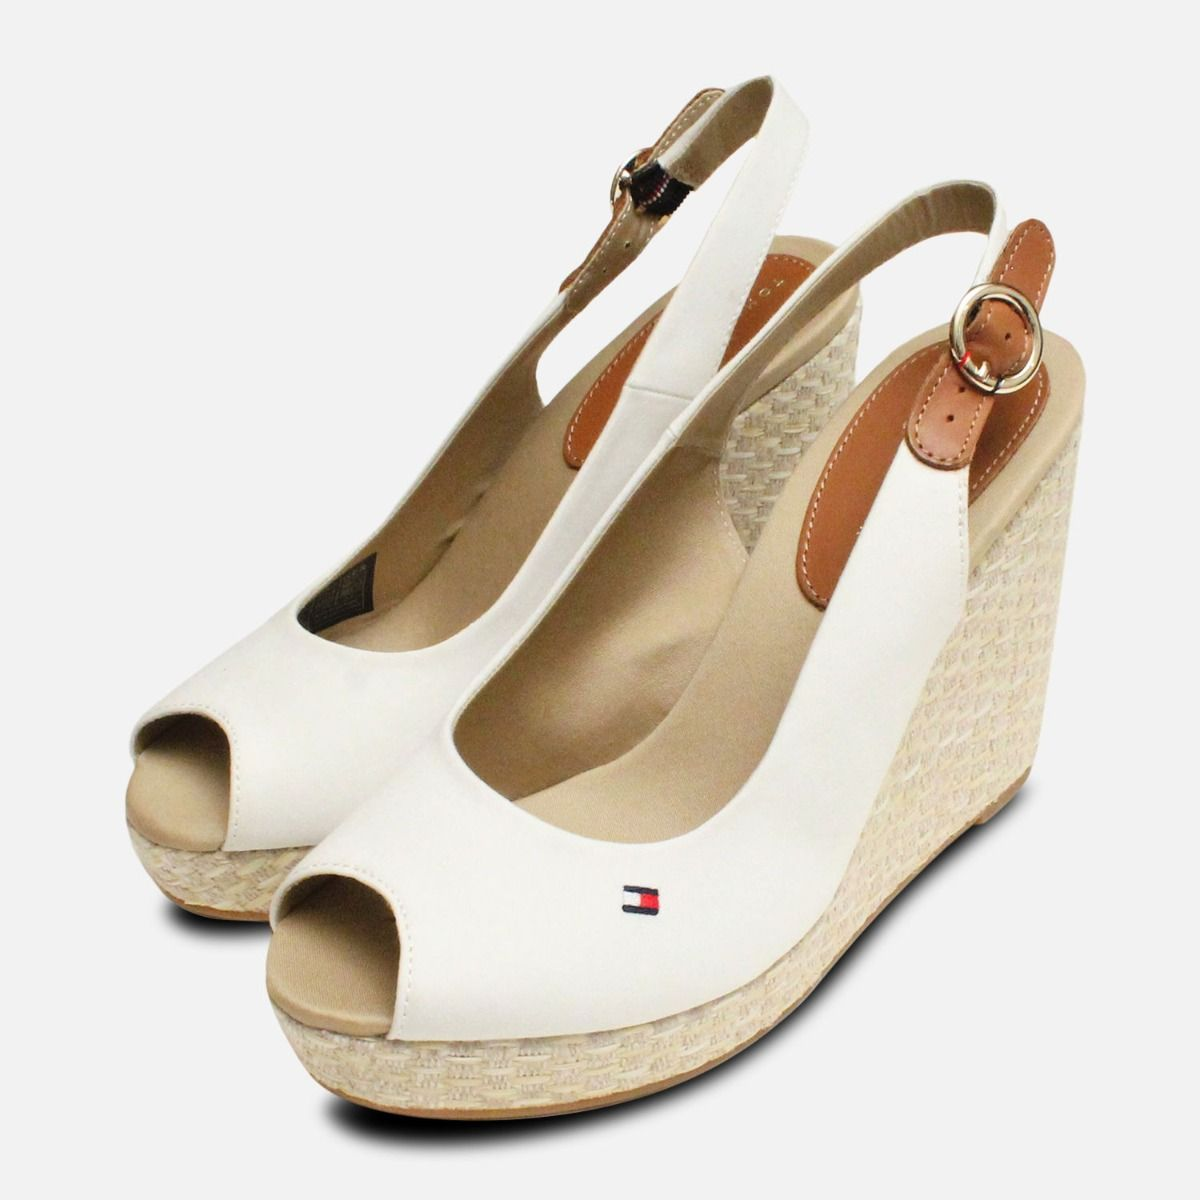 8a5ac150a898 Tommy Hilfiger Elena Platform Sandals in Whisper White